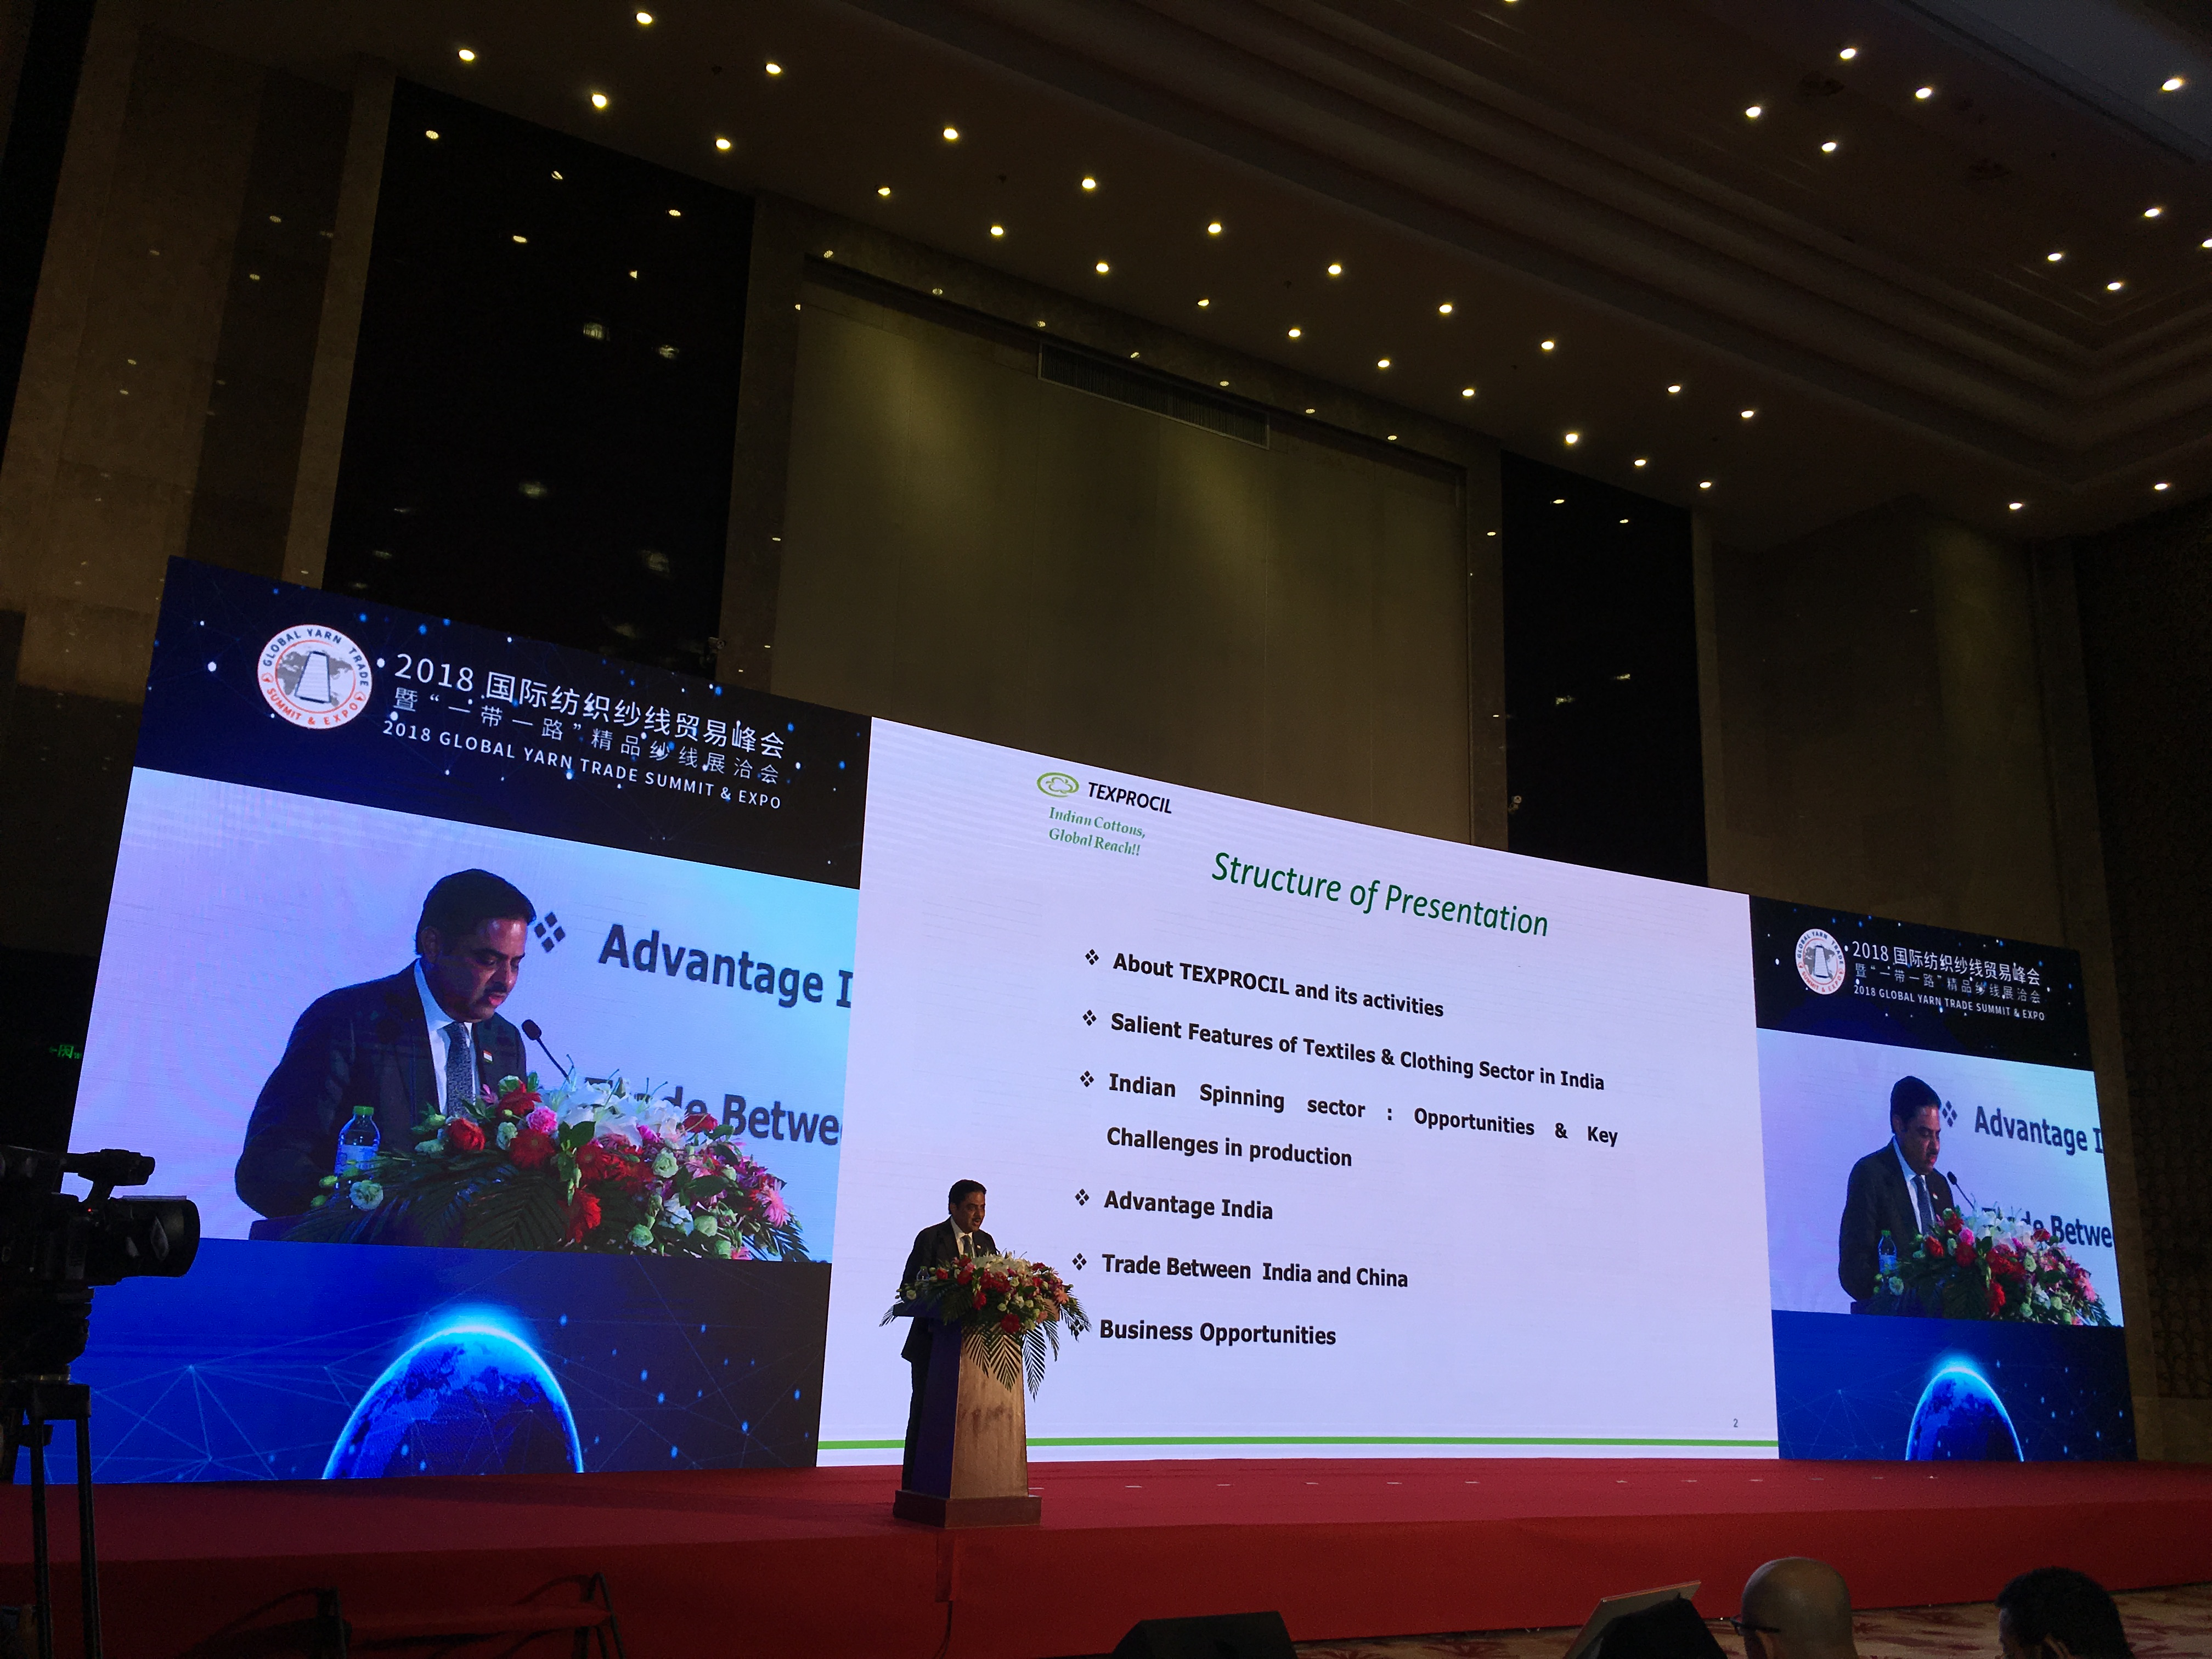 Global Yarn Trade Summit & Expo Qingdao-China 17th August 2018